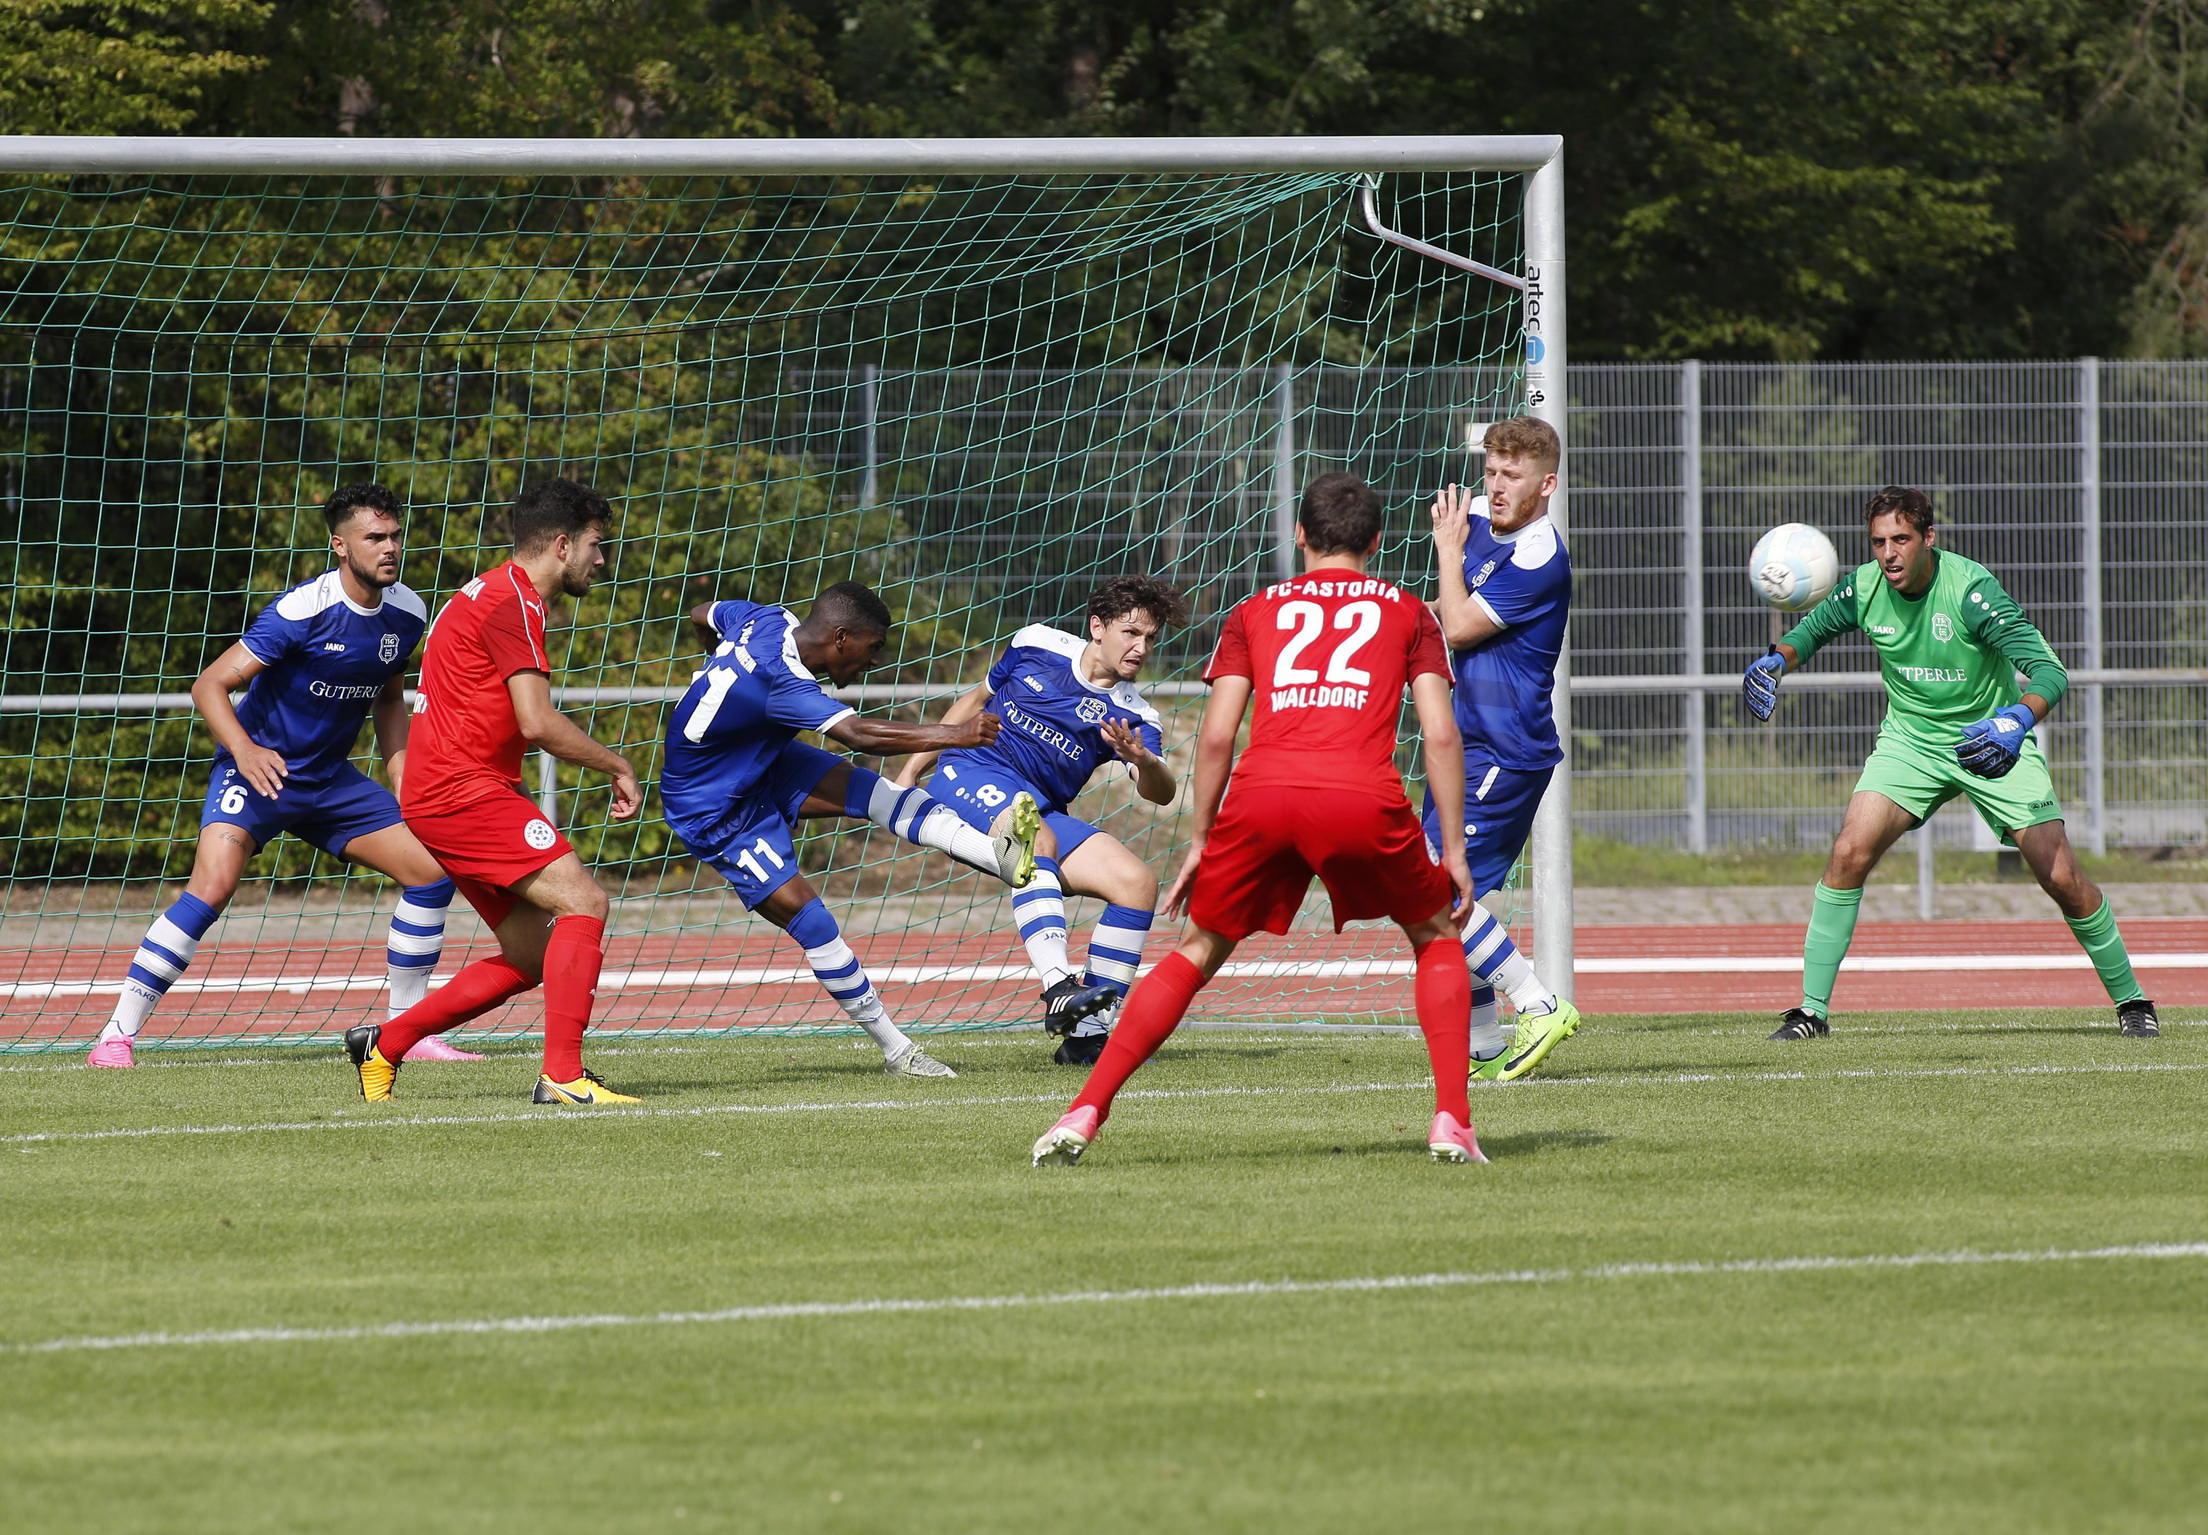 Walldorf. Fussball FCA Walldorf II gegen TSG 62 / 09 Weinheim.  TSG Weinheim klaert mit allen Mannen. 26.08.2017 - Helmut Pfeifer.